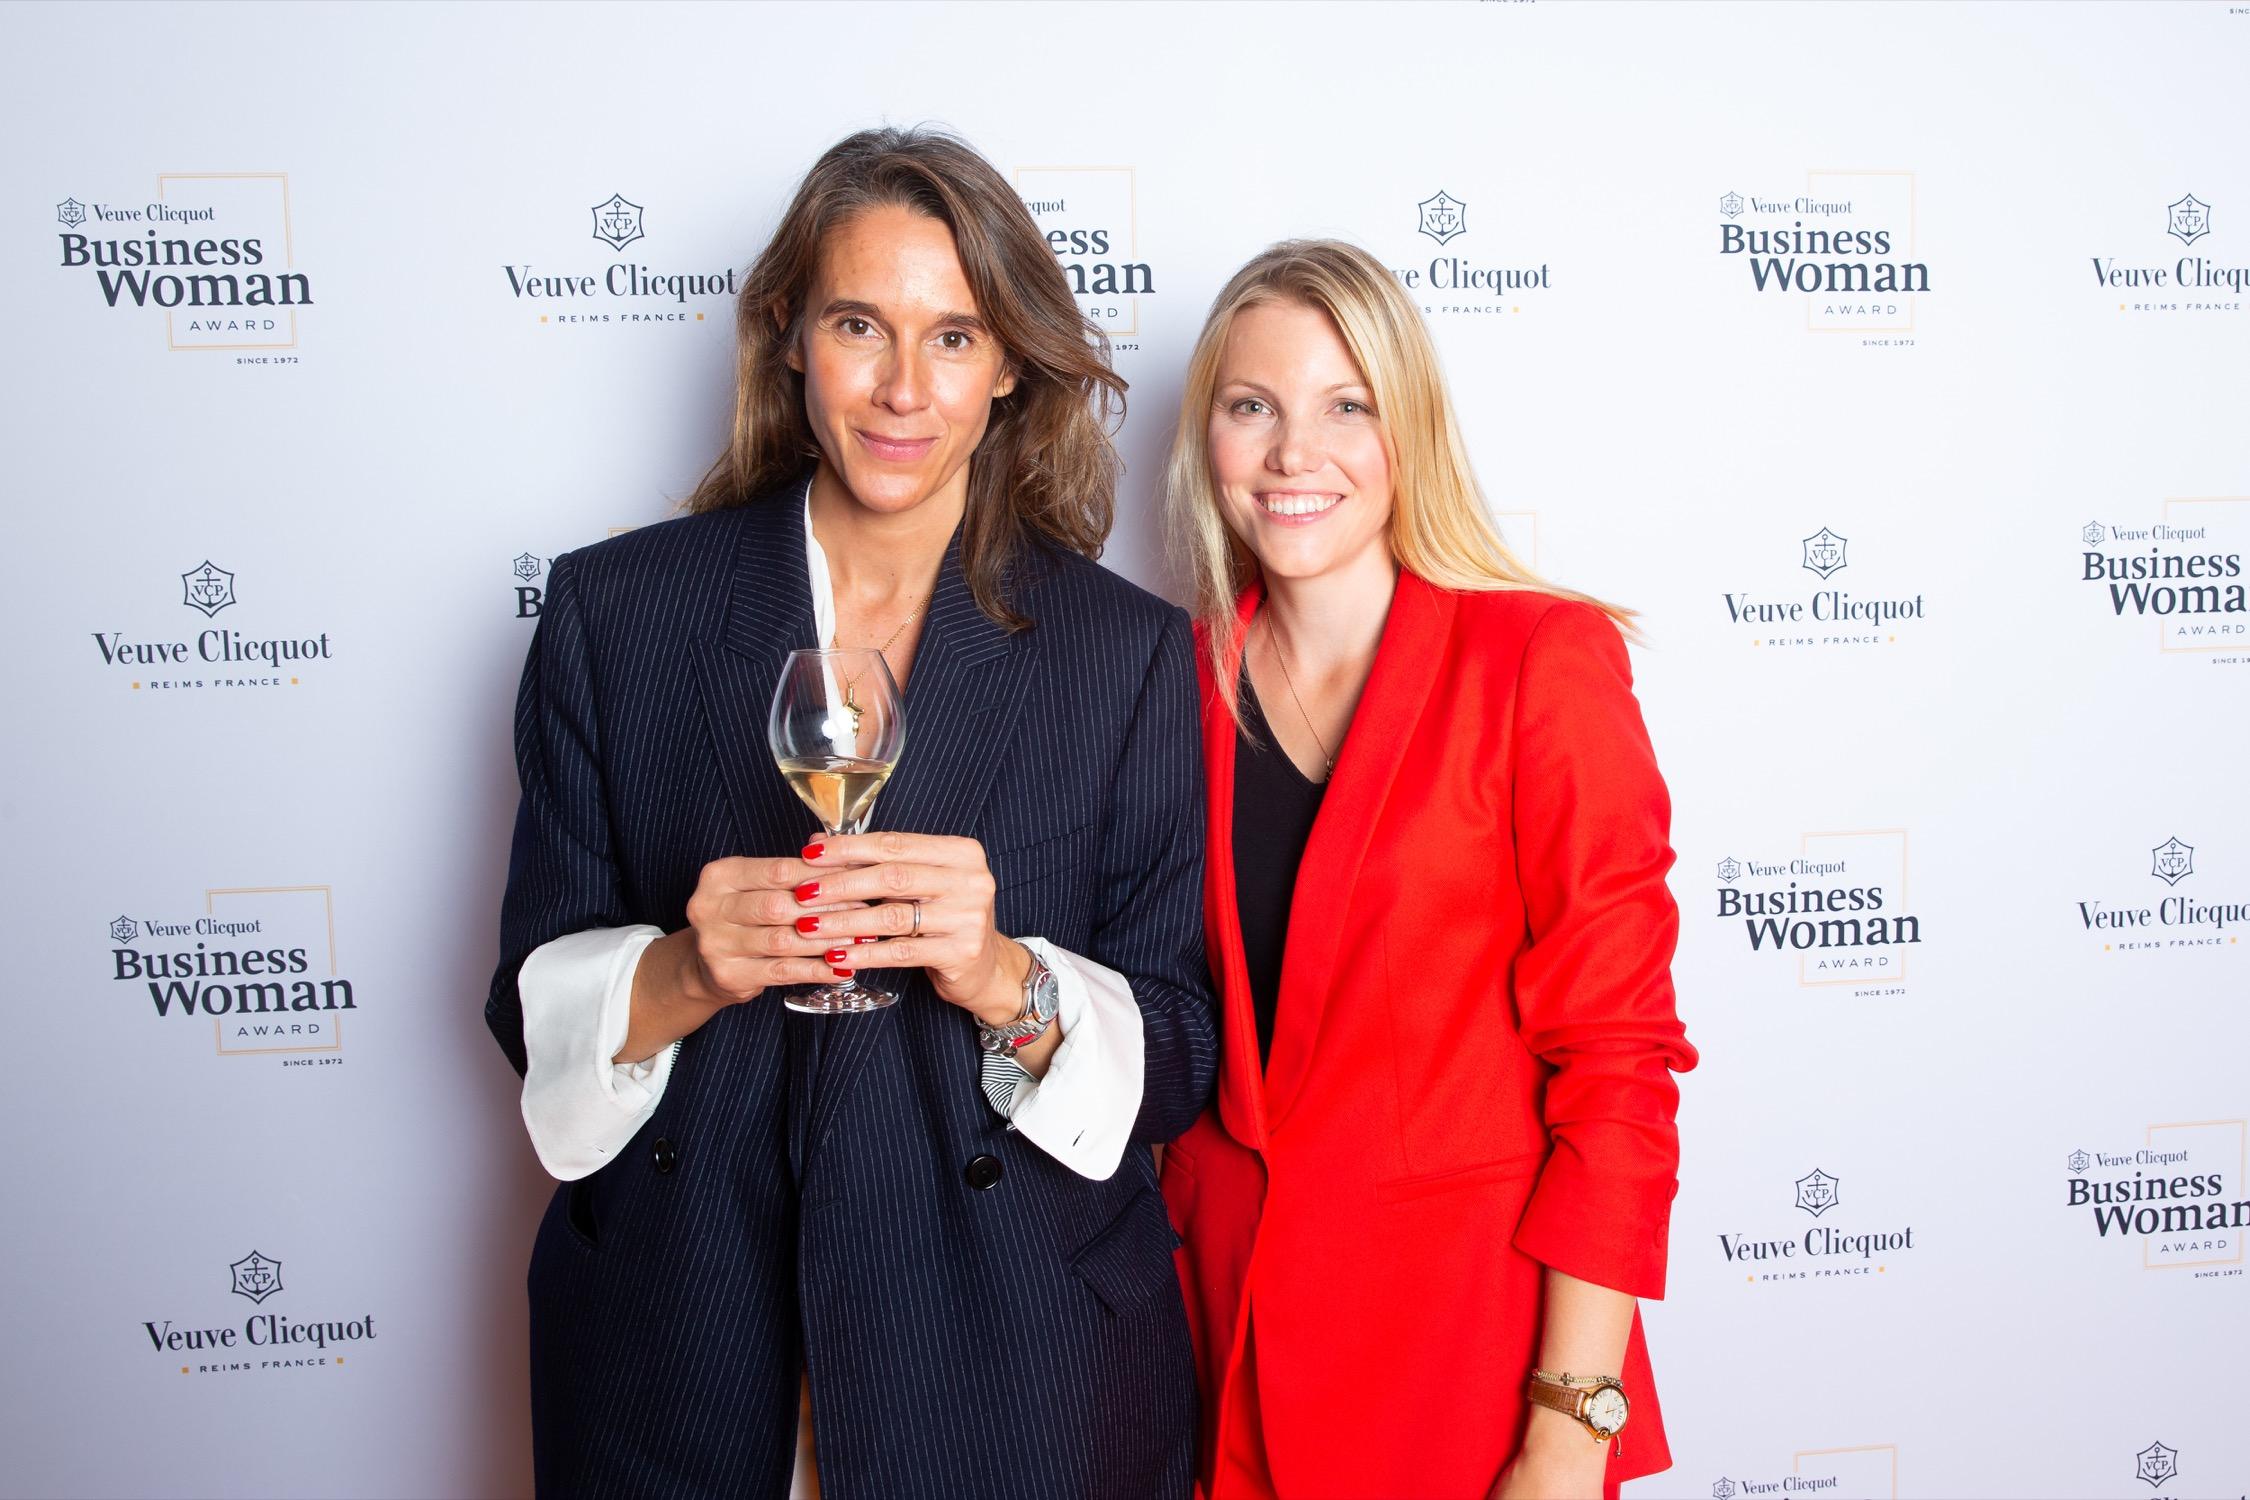 Carole Bildé and the winner of New Generation Award 2019 Olga Dubey